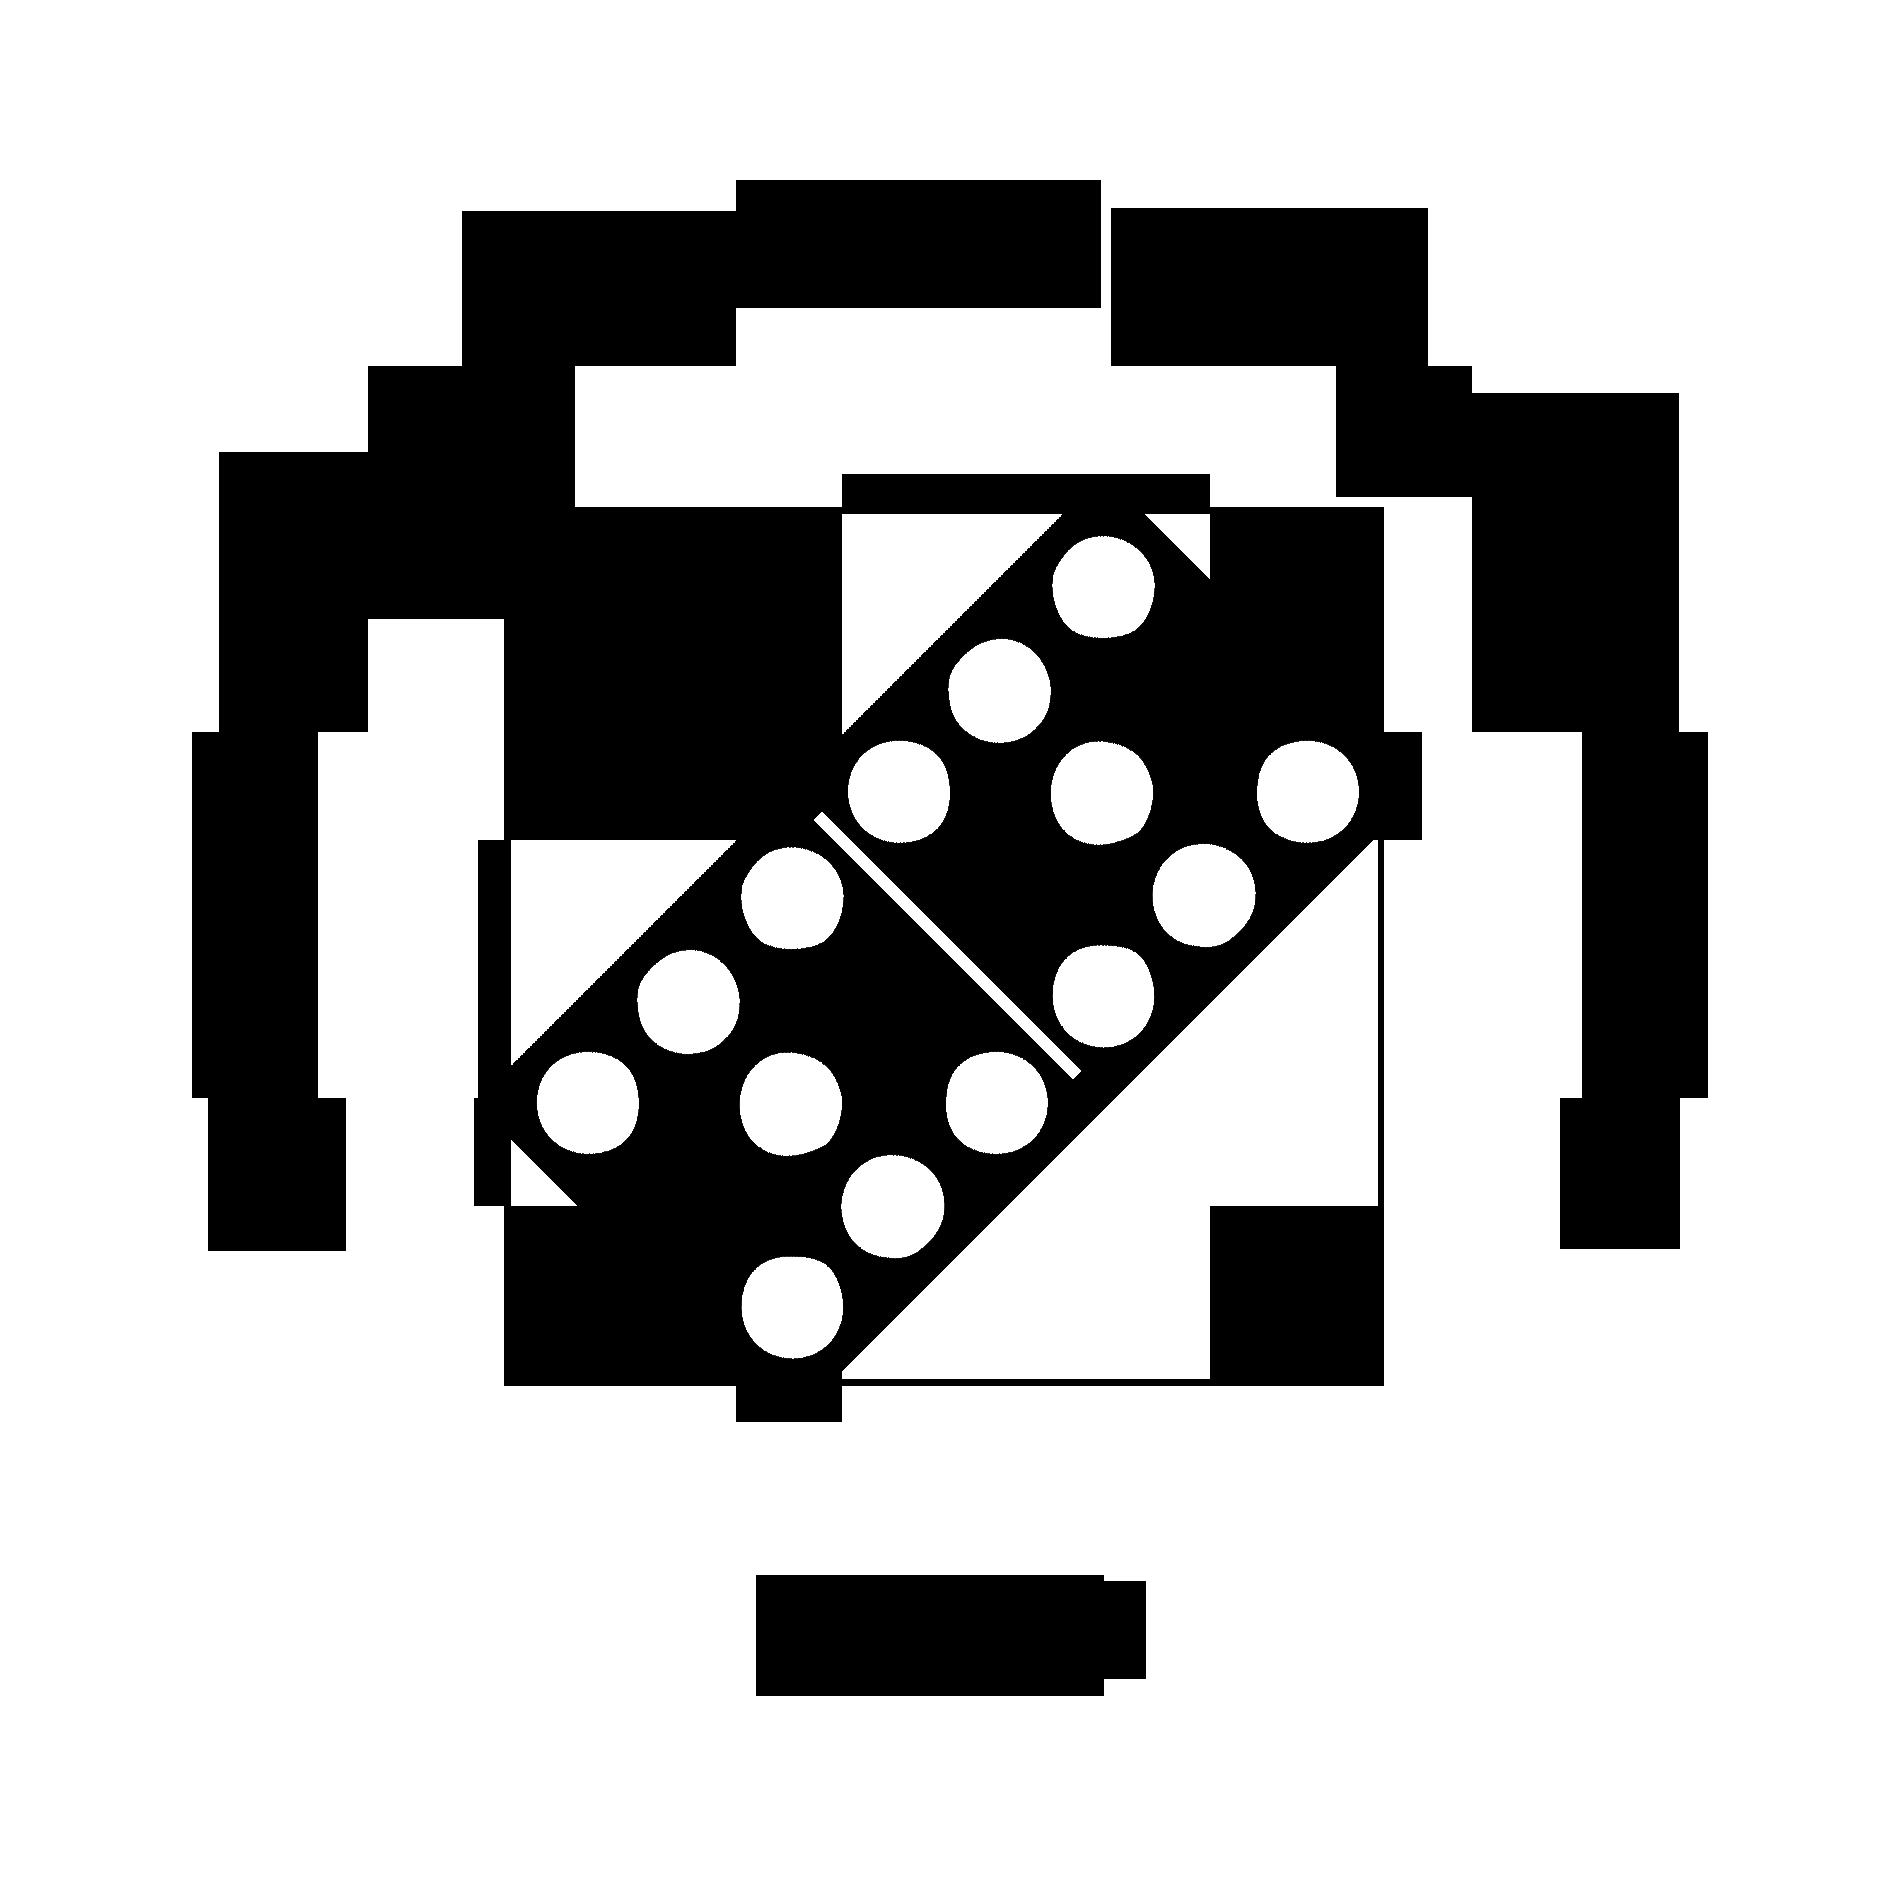 Fédération Internationale de Domino